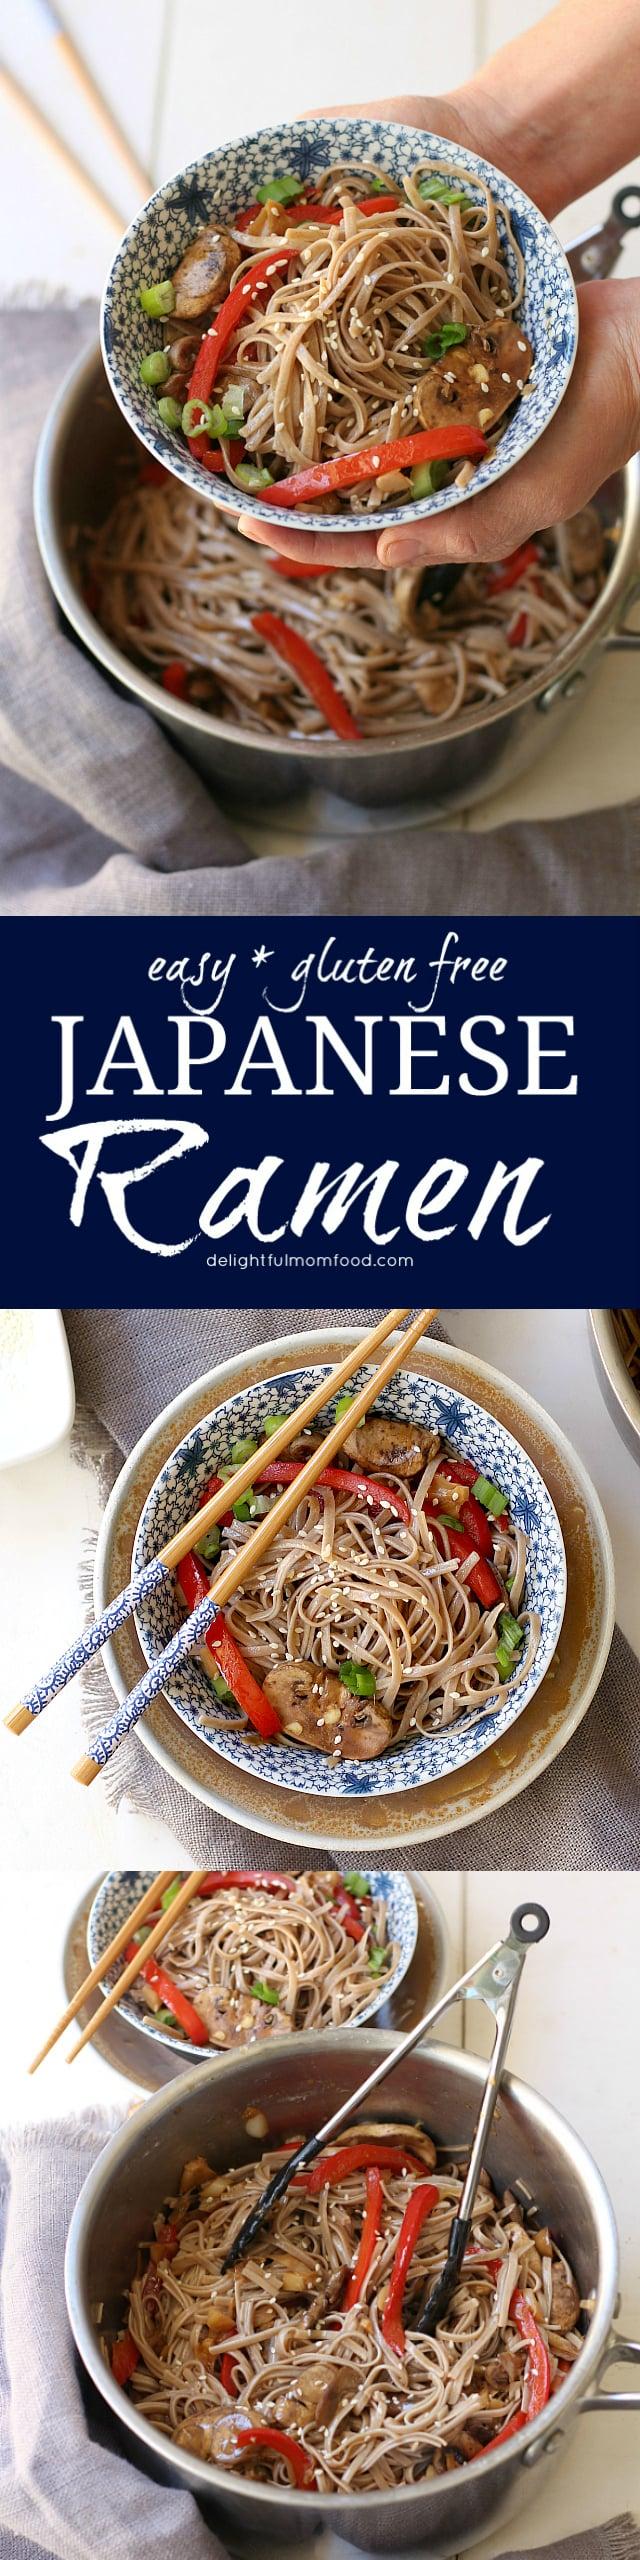 Japanese Ramen Noodle Recipes